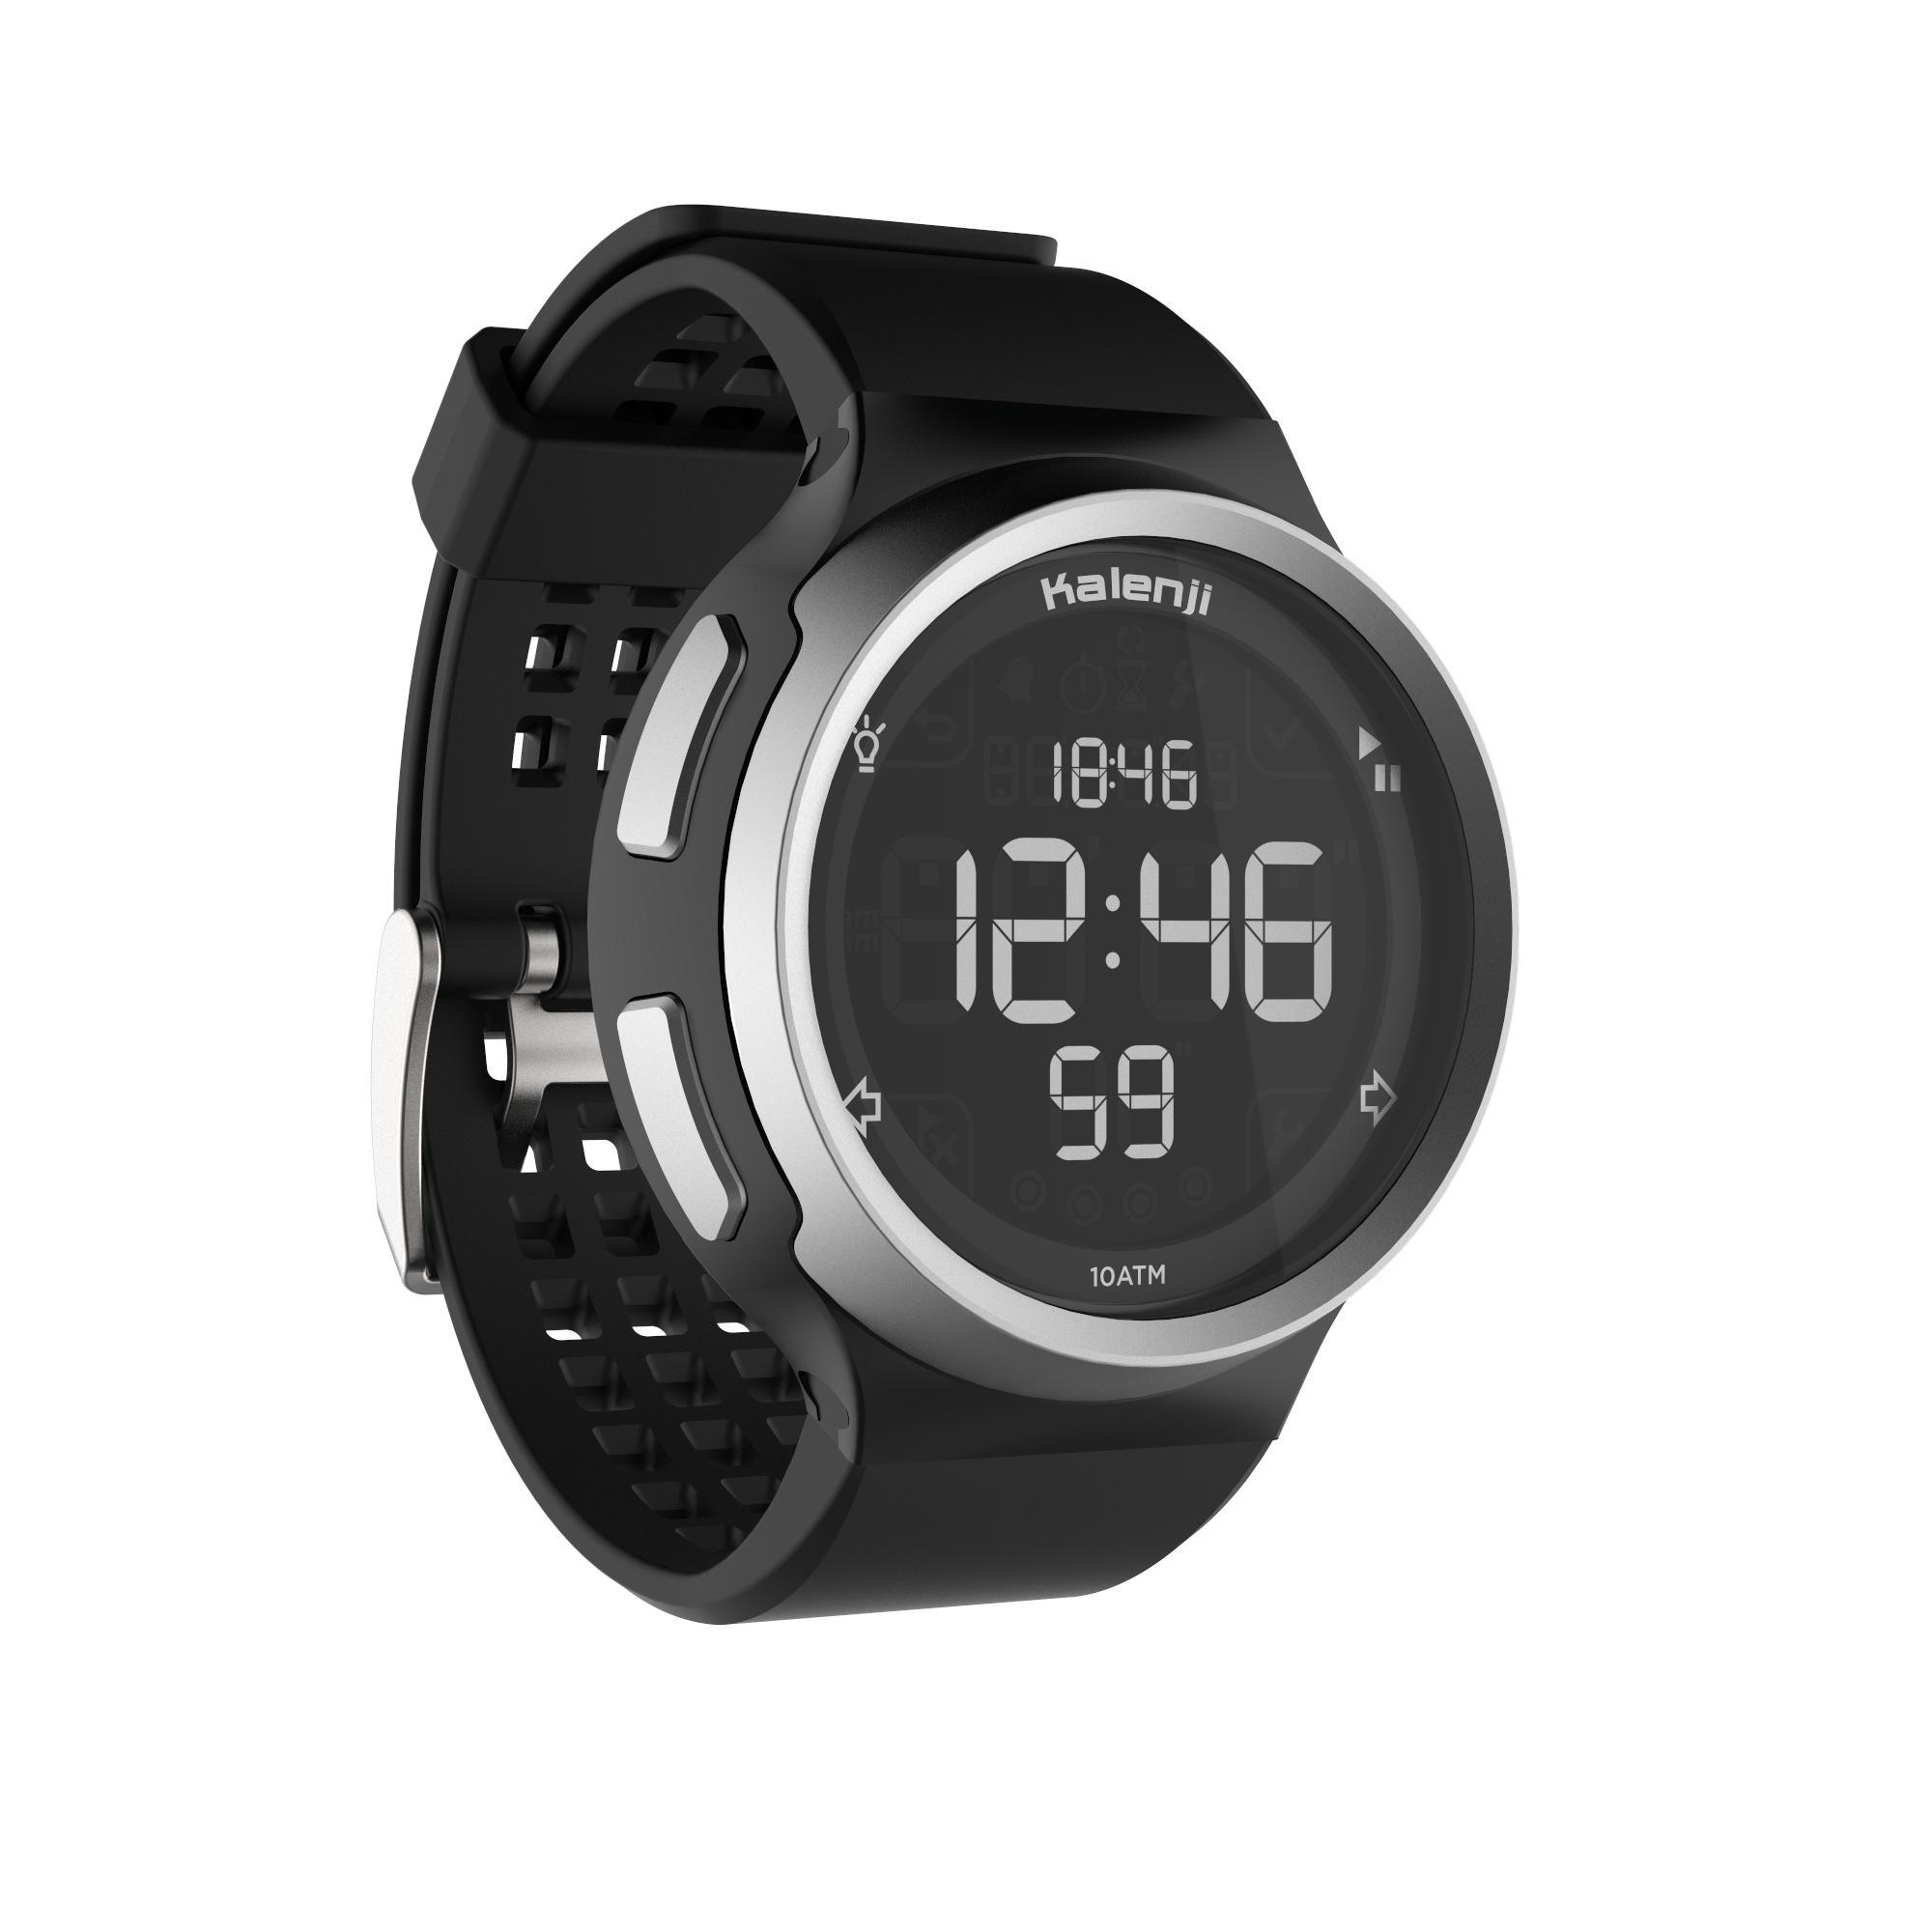 W900 Men's Running Stopwatch - Black reverse